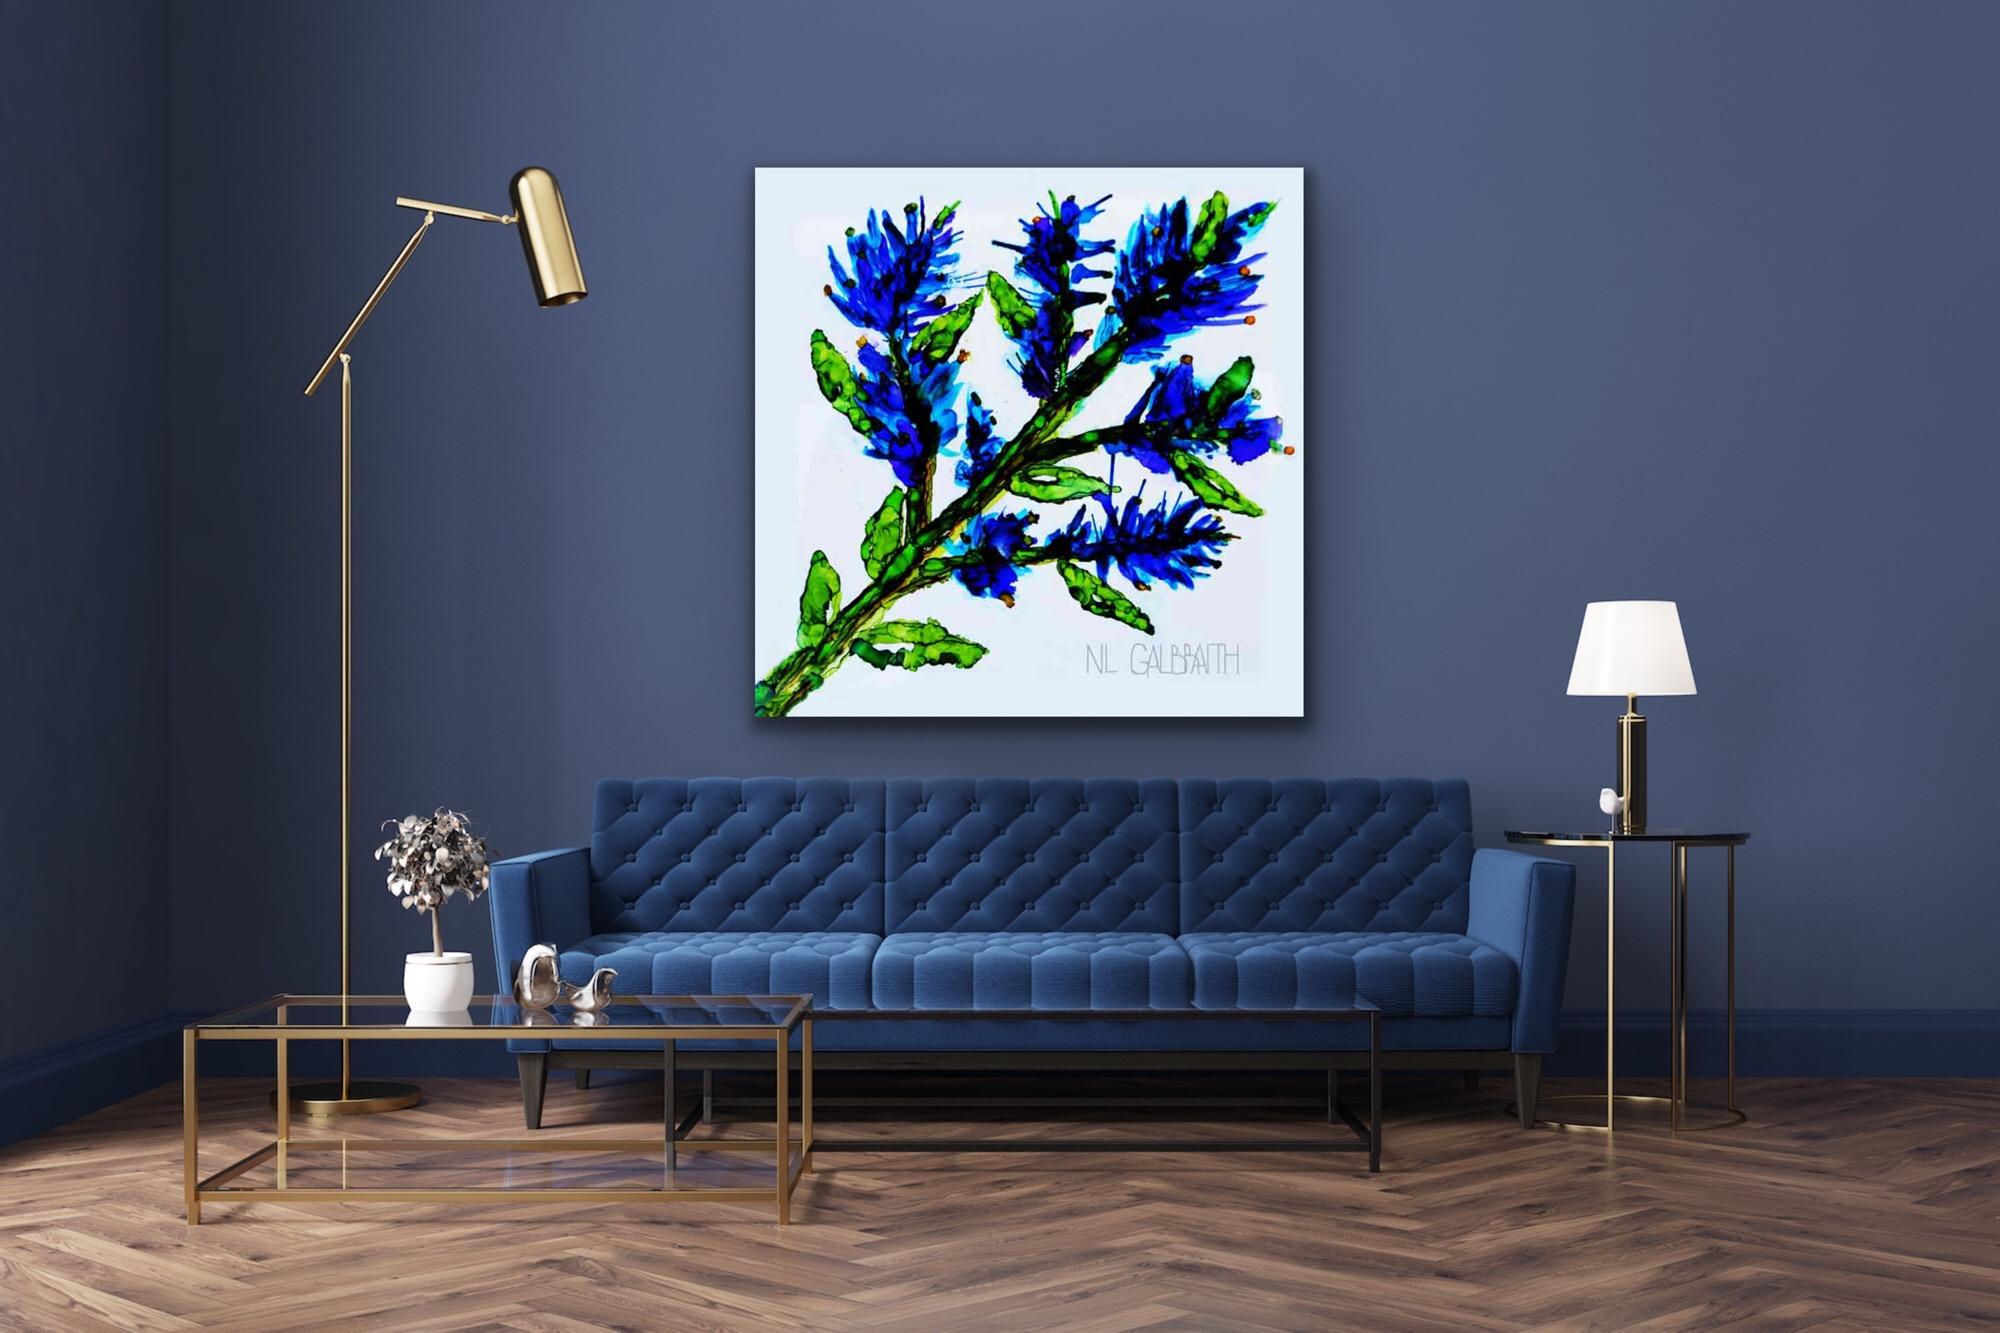 Fine Art Large Blue Sprig Flower Graphic Over a Blue Sofa